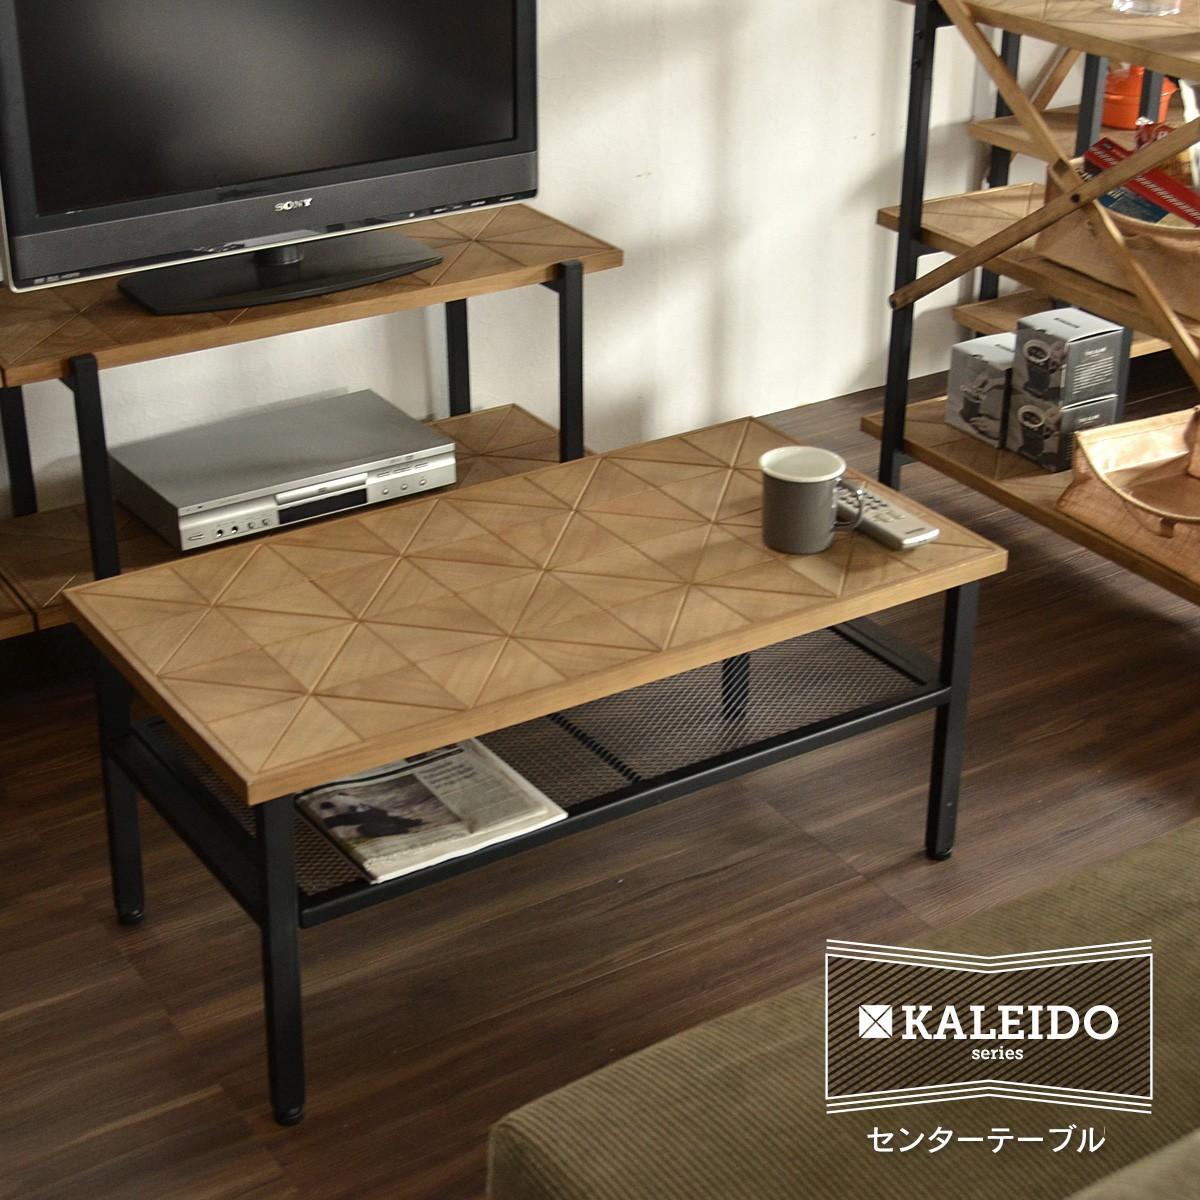 KALEIDO カレイド センターテーブル 幅90 ローテーブル 木製 天然木 アイアン リビング おしゃれ デザイン カフェ